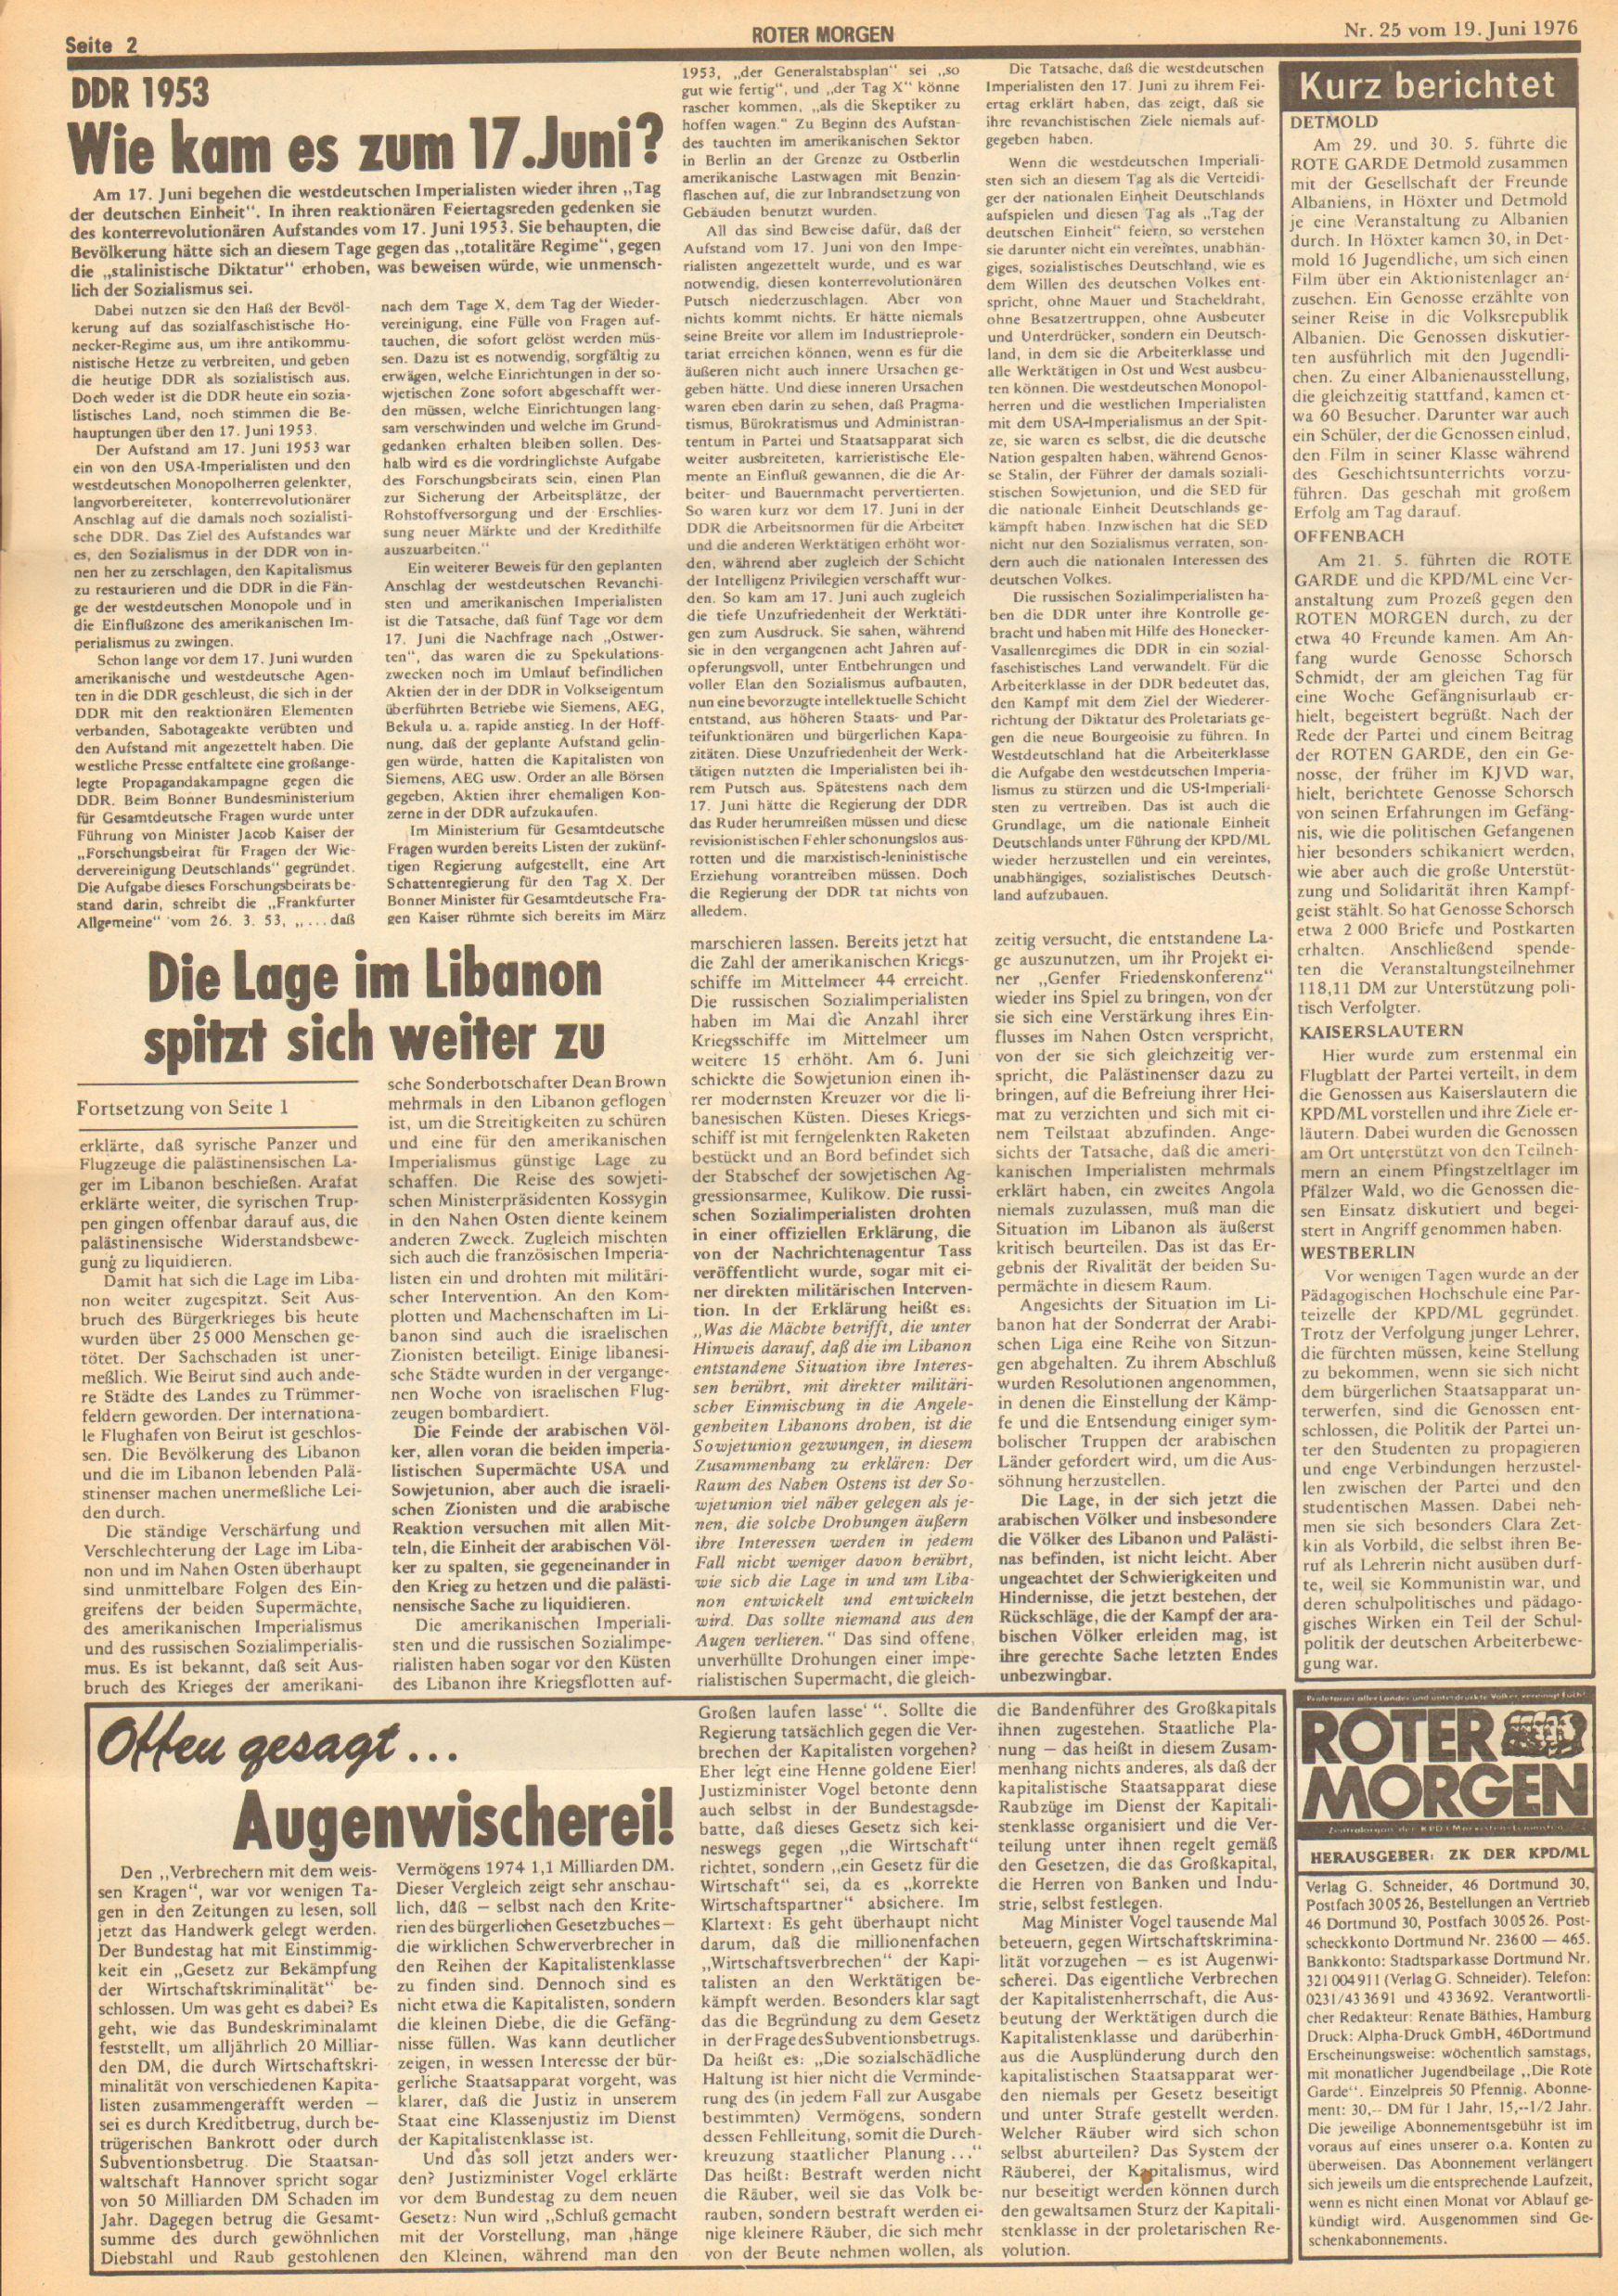 Roter Morgen, 10. Jg., 19. Juni 1976, Nr. 25, Seite 2